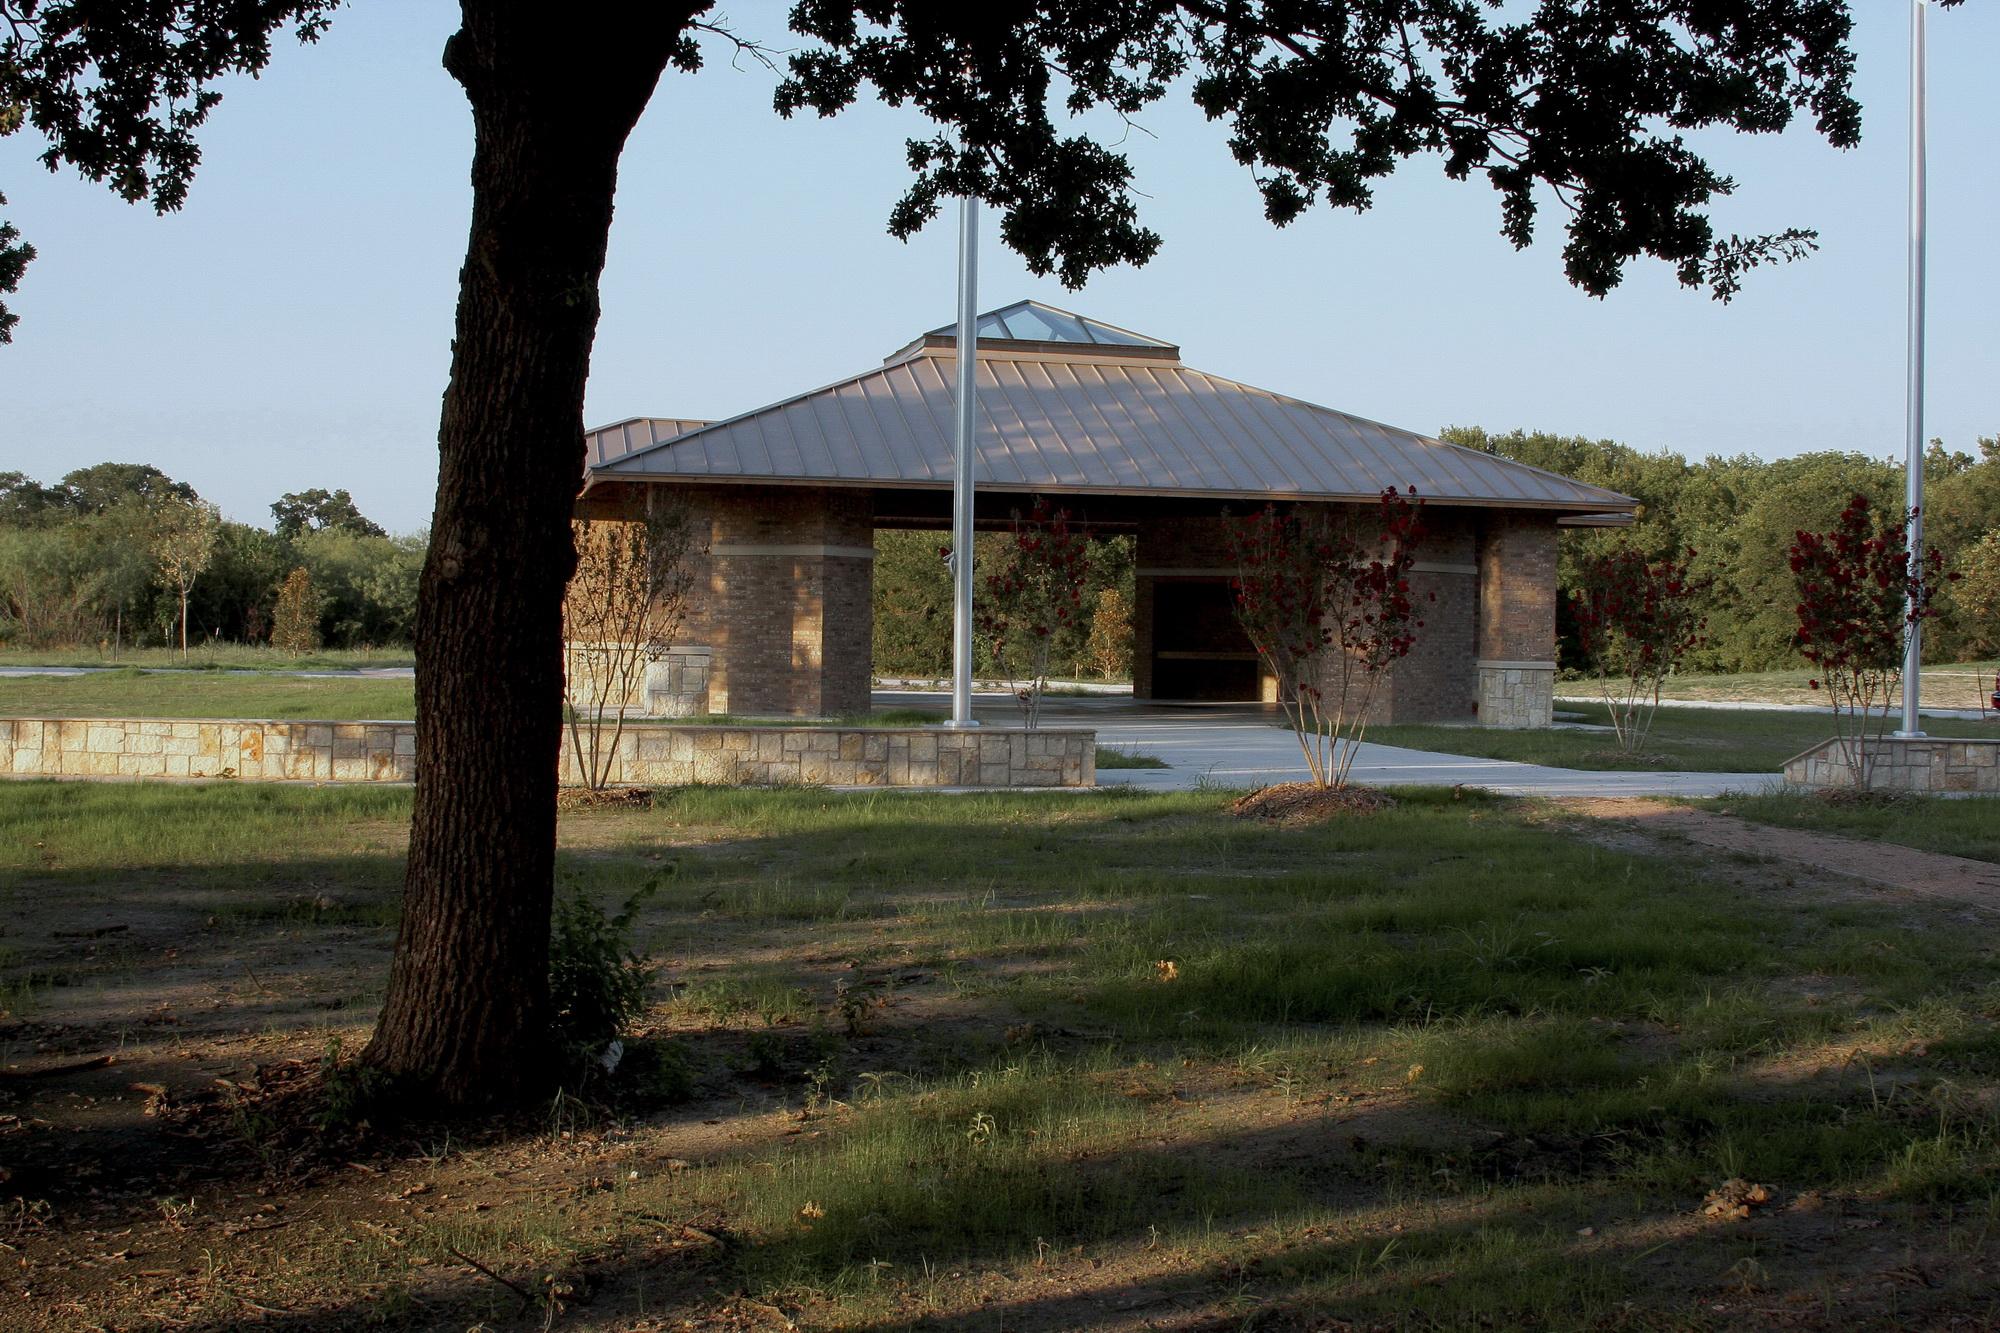 garden outdoor pavilion indoor pavilion cemetery office funeral home